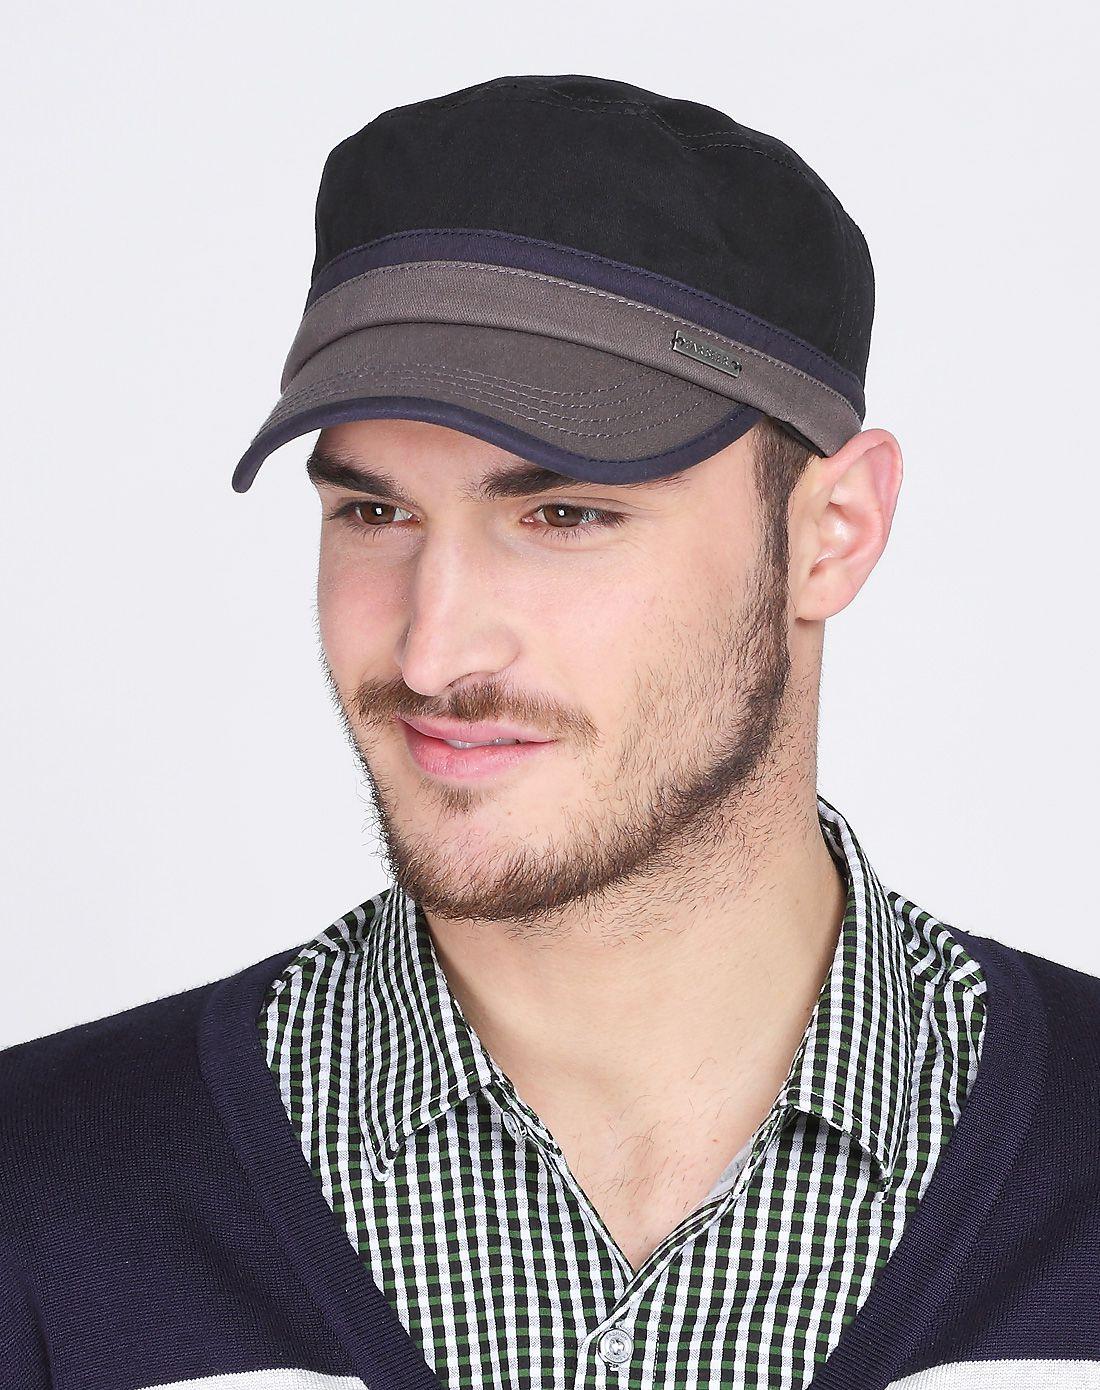 VEC帽子男女款 韩版户外时尚休闲纯色鸭舌帽